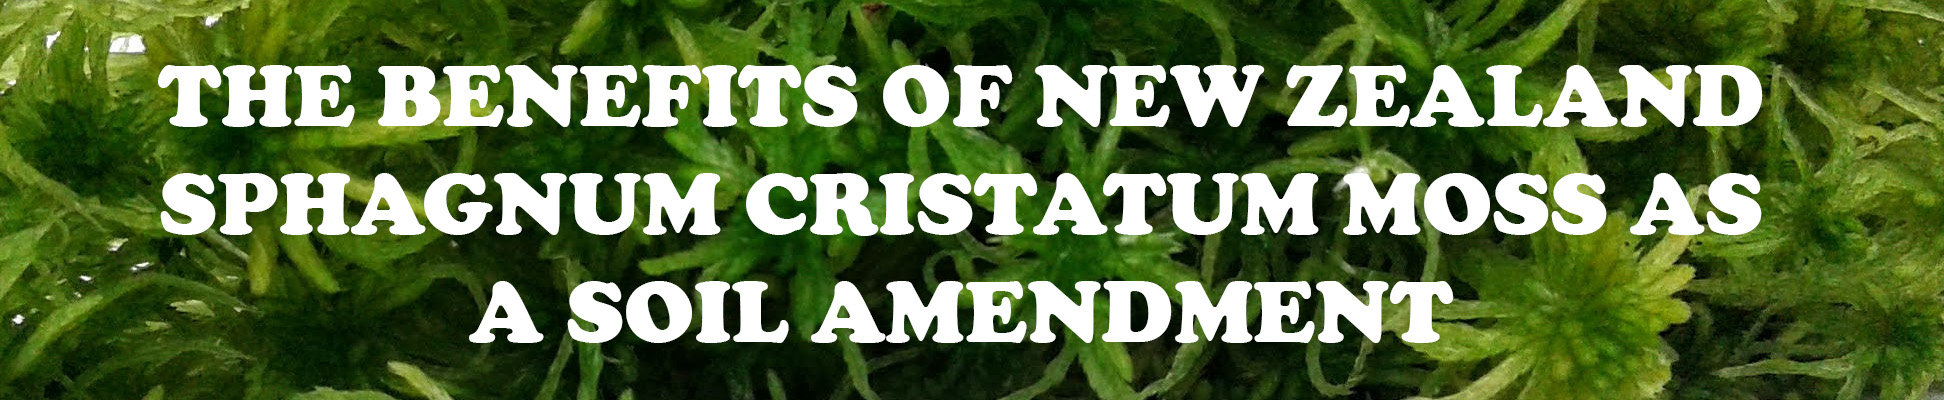 The benefits of using New Zealand sphagnum cristatum Moss as a soil amendment.